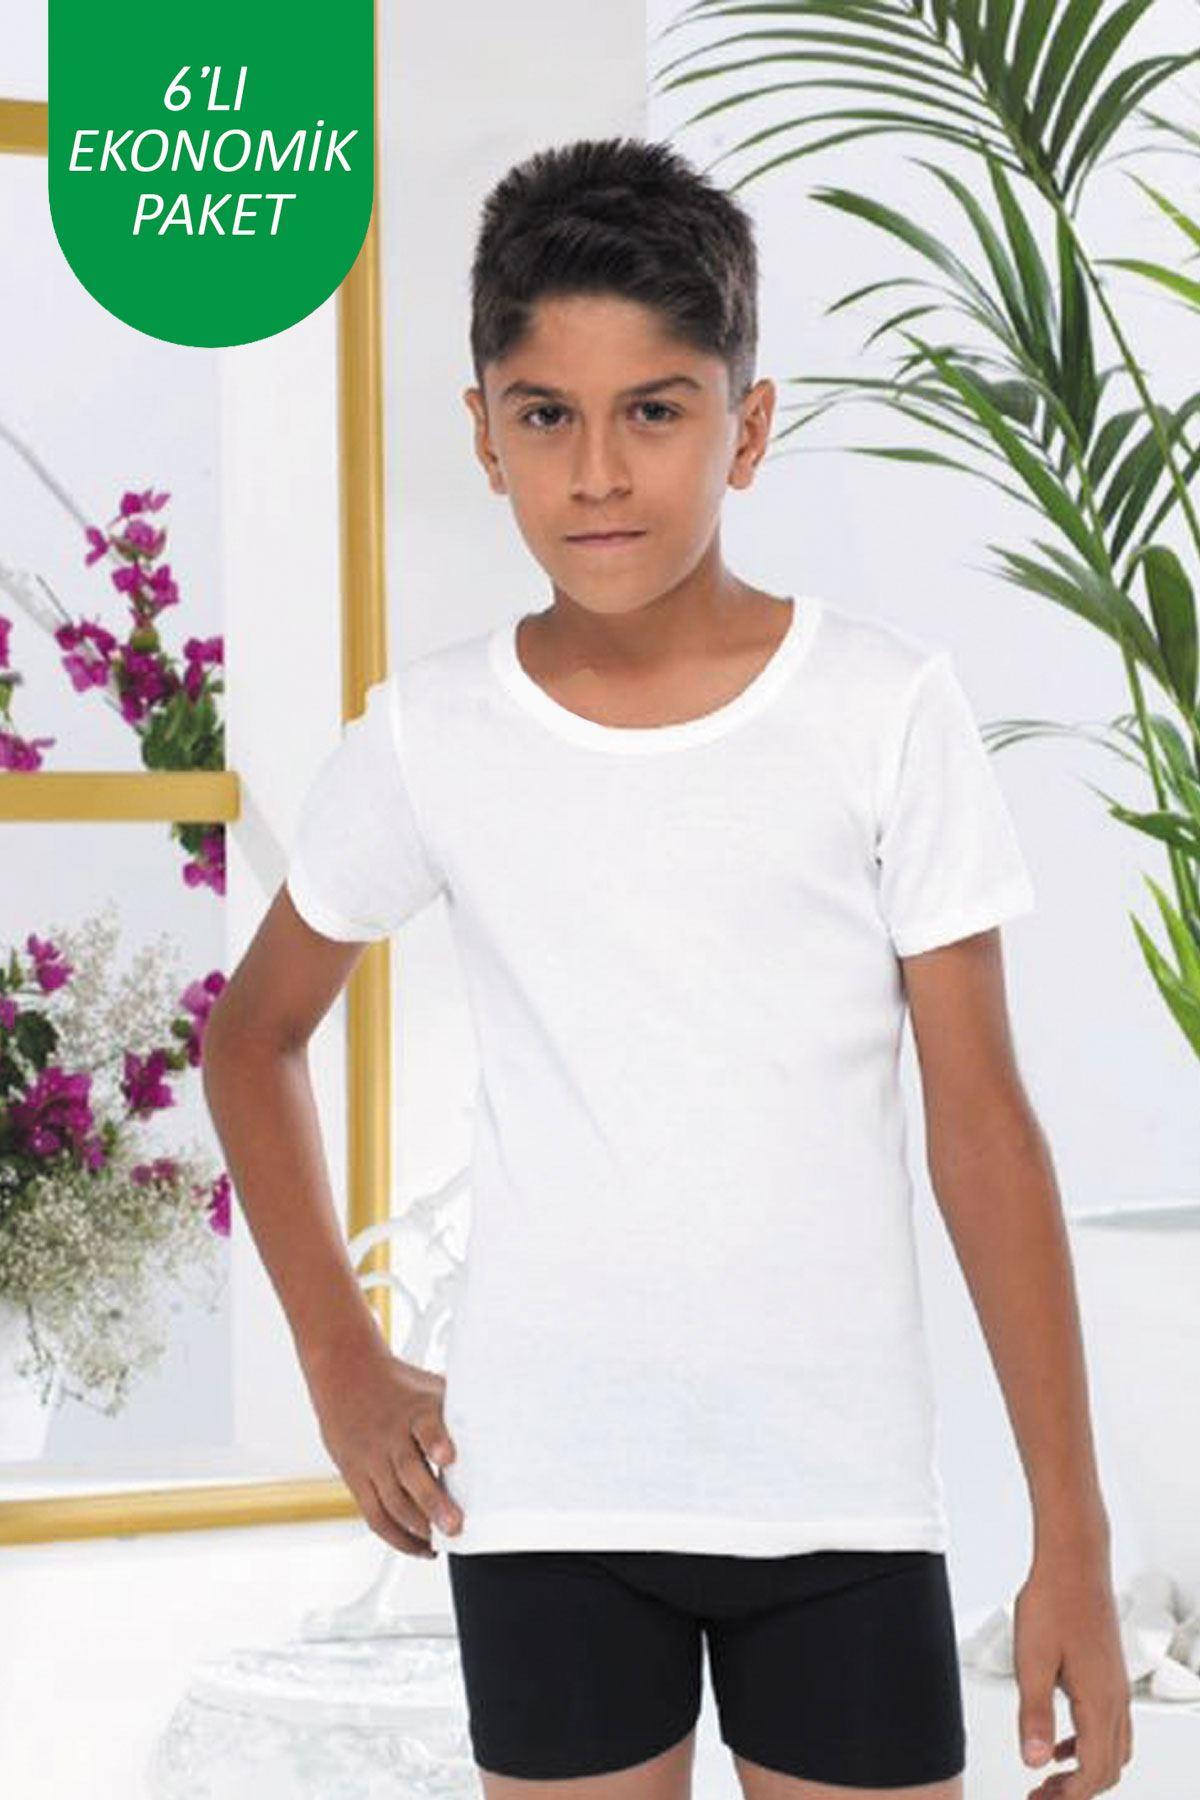 Beyaz Erkek Çocuk 6 lı Paket E Serisi Yuvarlak Yaka Kısa Kollu Ribana Fanila Atlet 202 - E